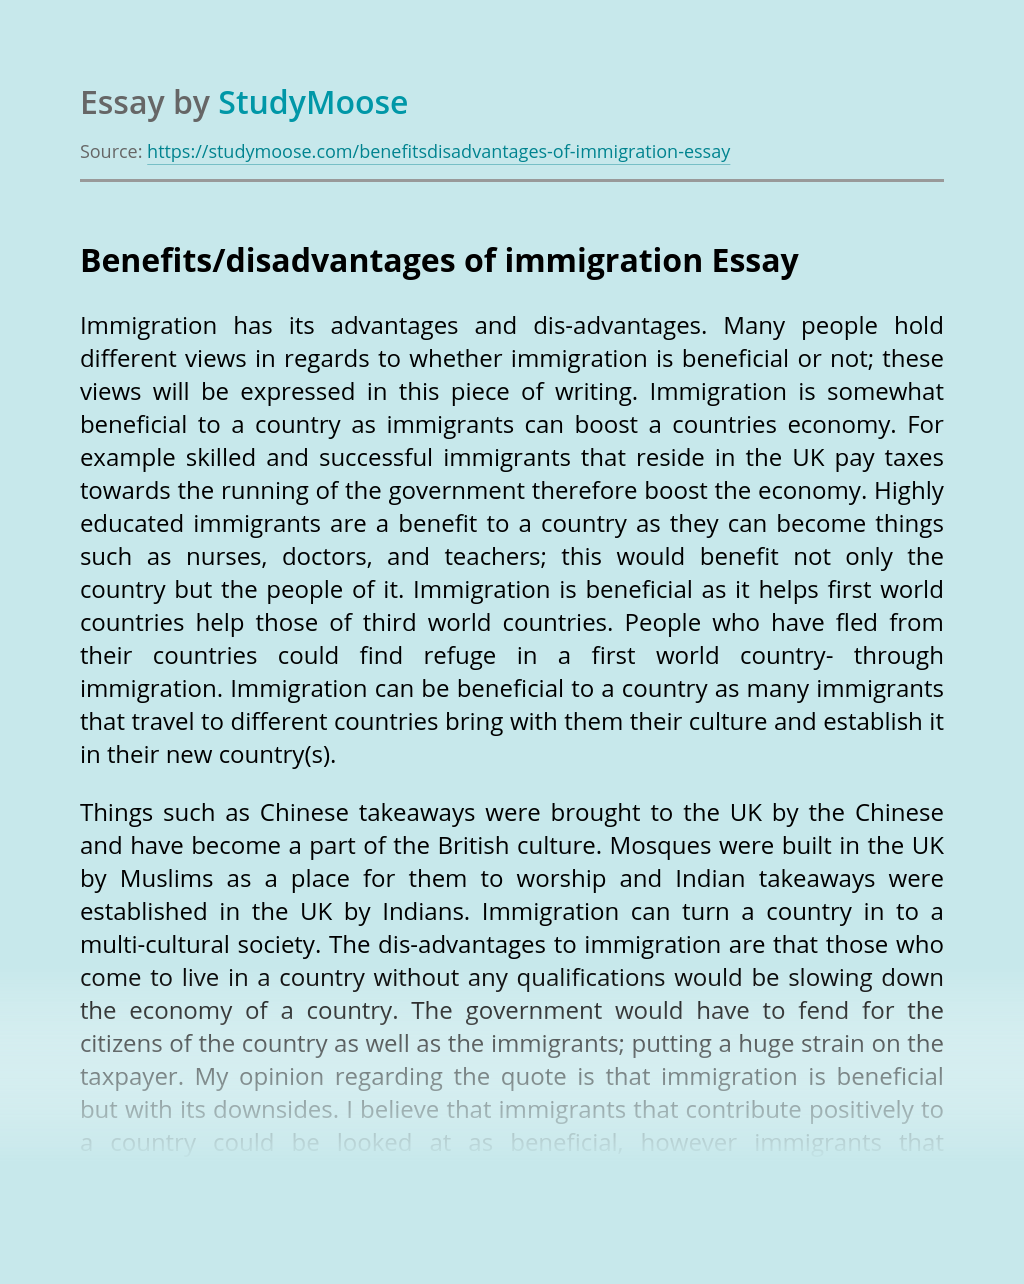 Benefits/disadvantages of immigration